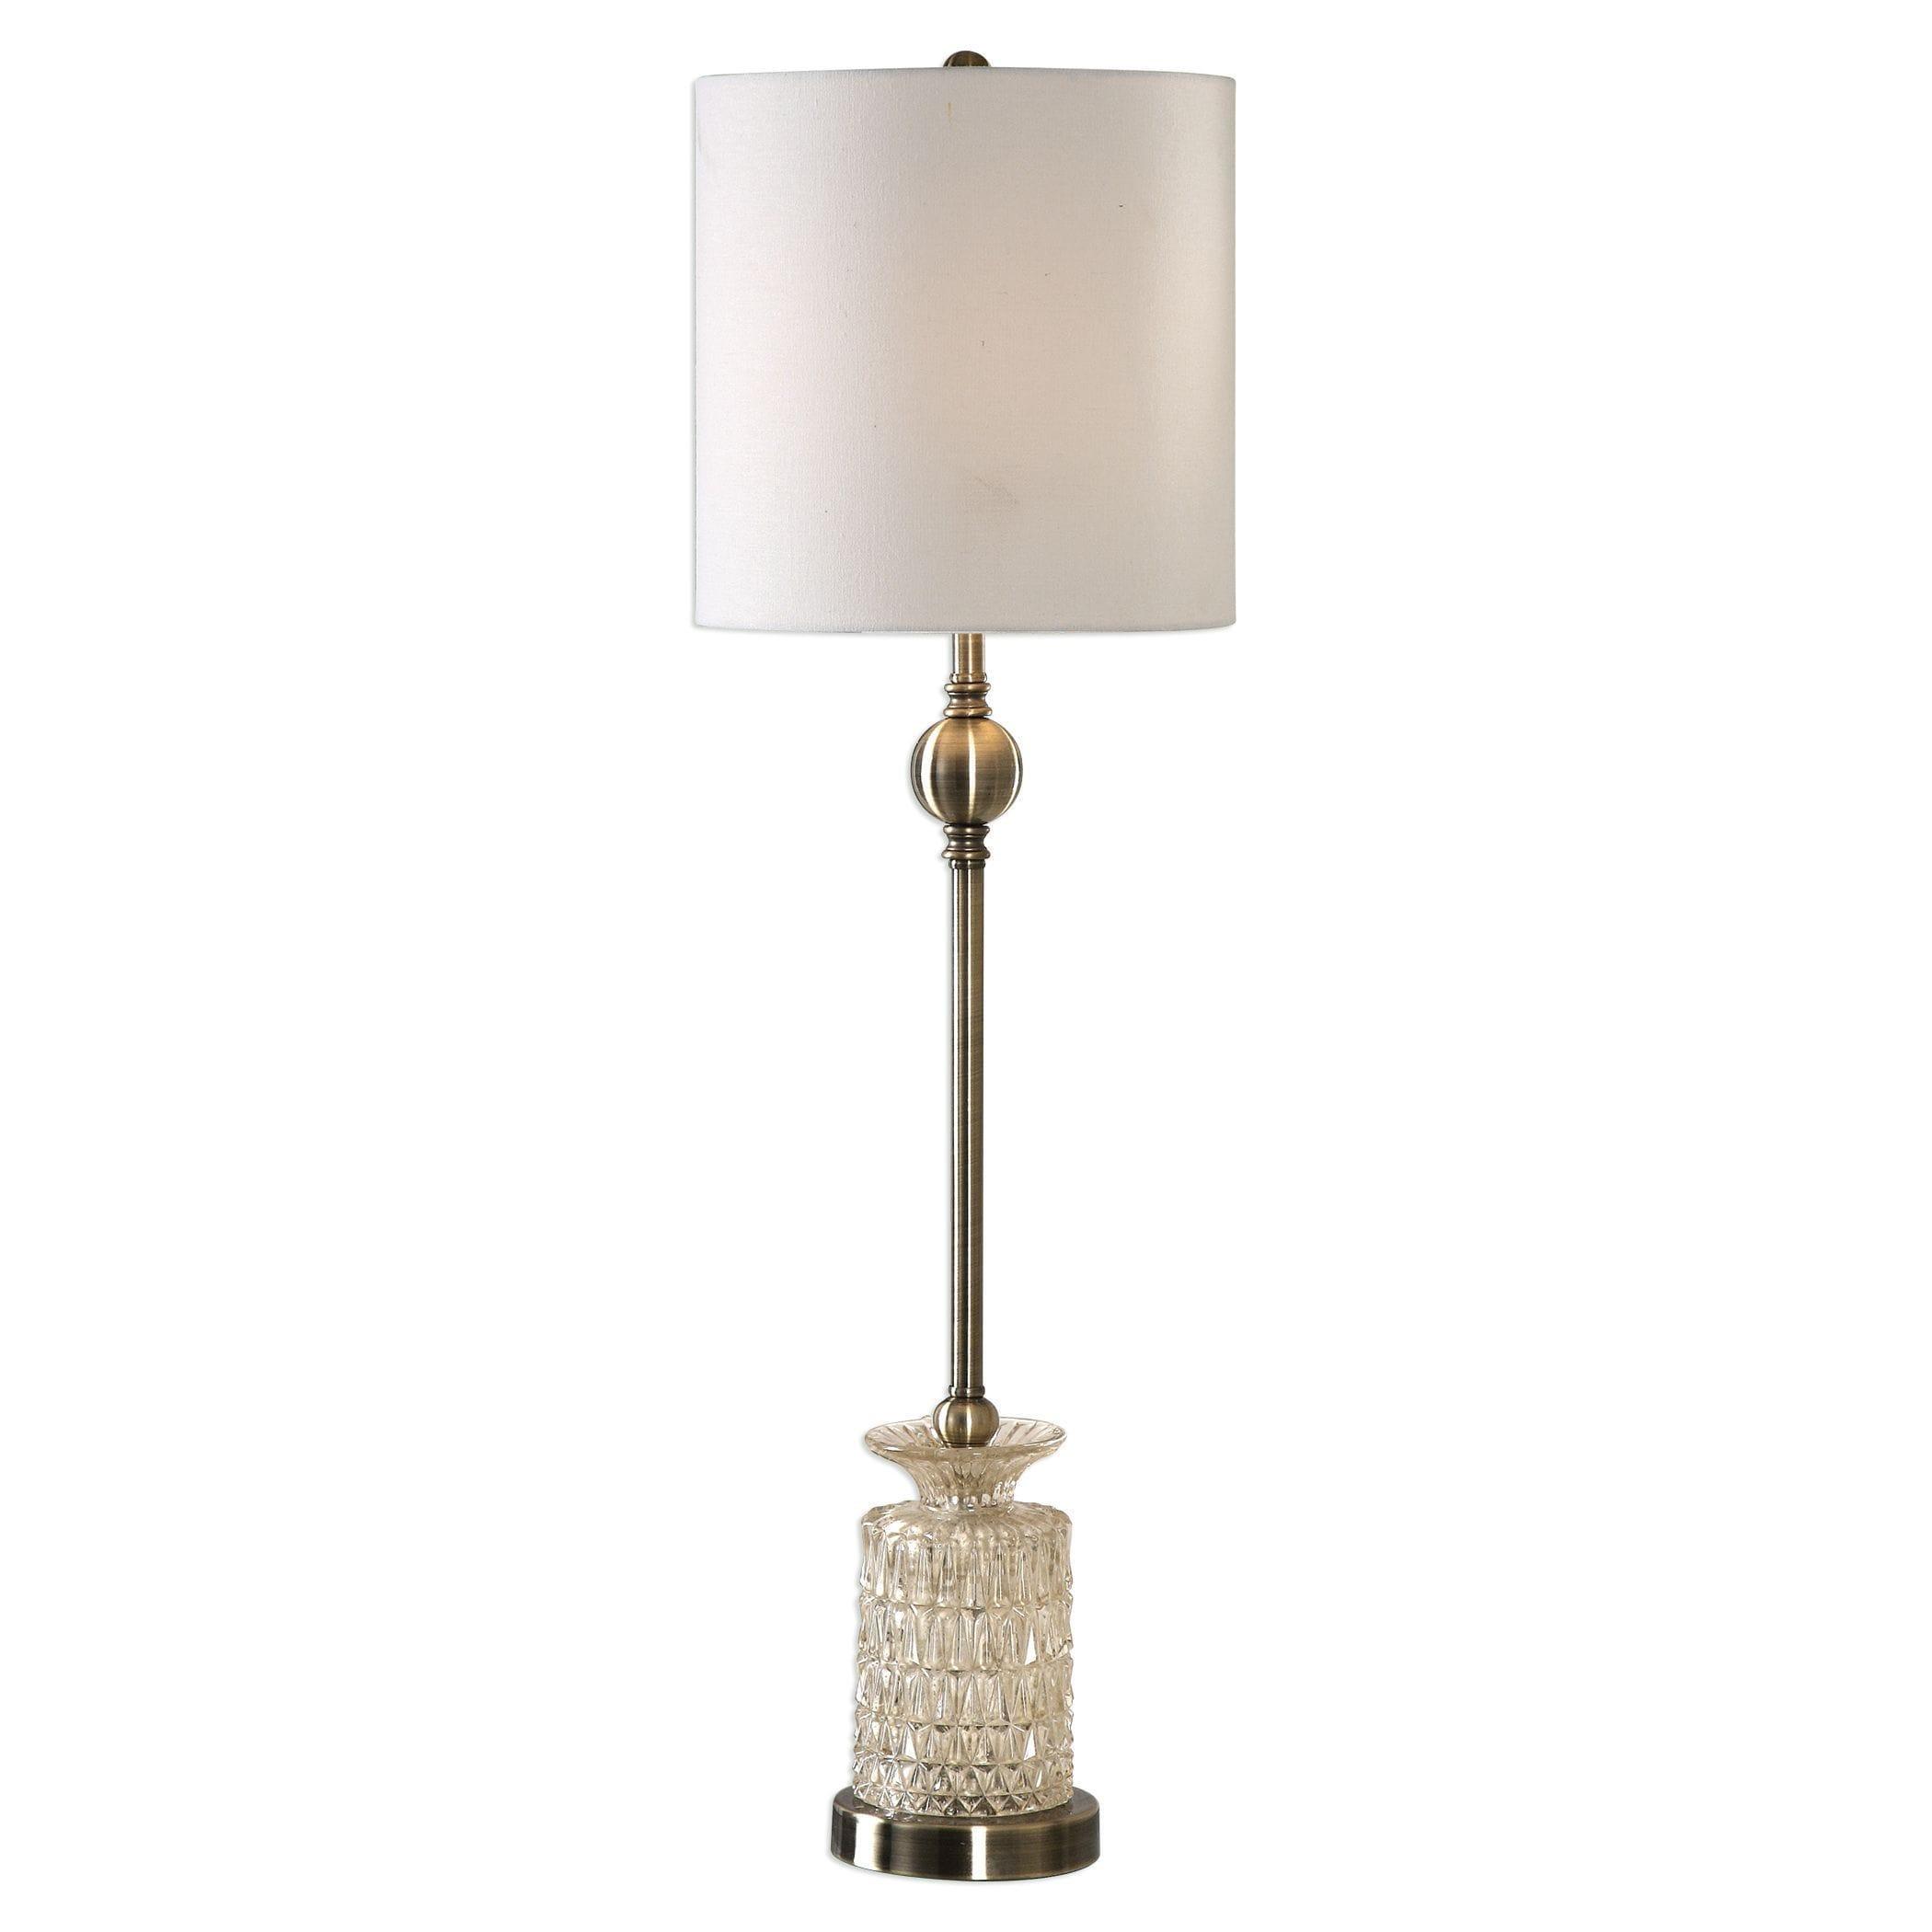 Uttermost Flaviana Antique Brass Buffet Lamp   Free Shipping Today    Overstock.com   20351062